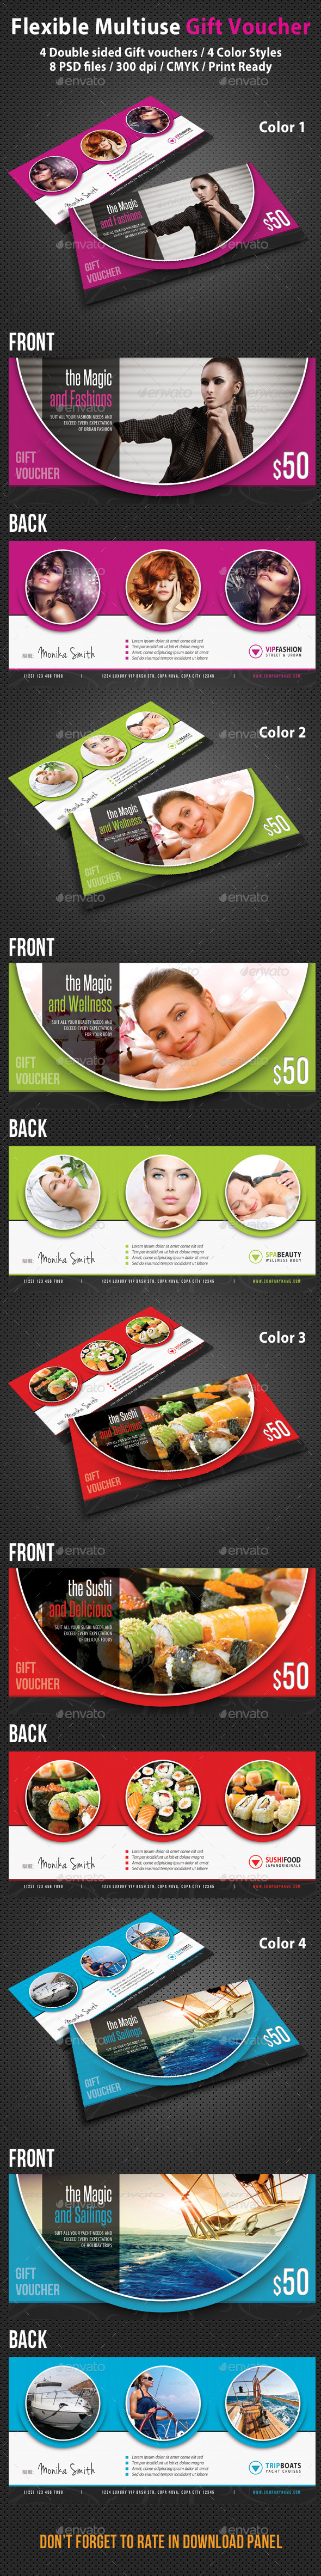 GraphicRiver Flexible Multiuse Gift Voucher 9156309